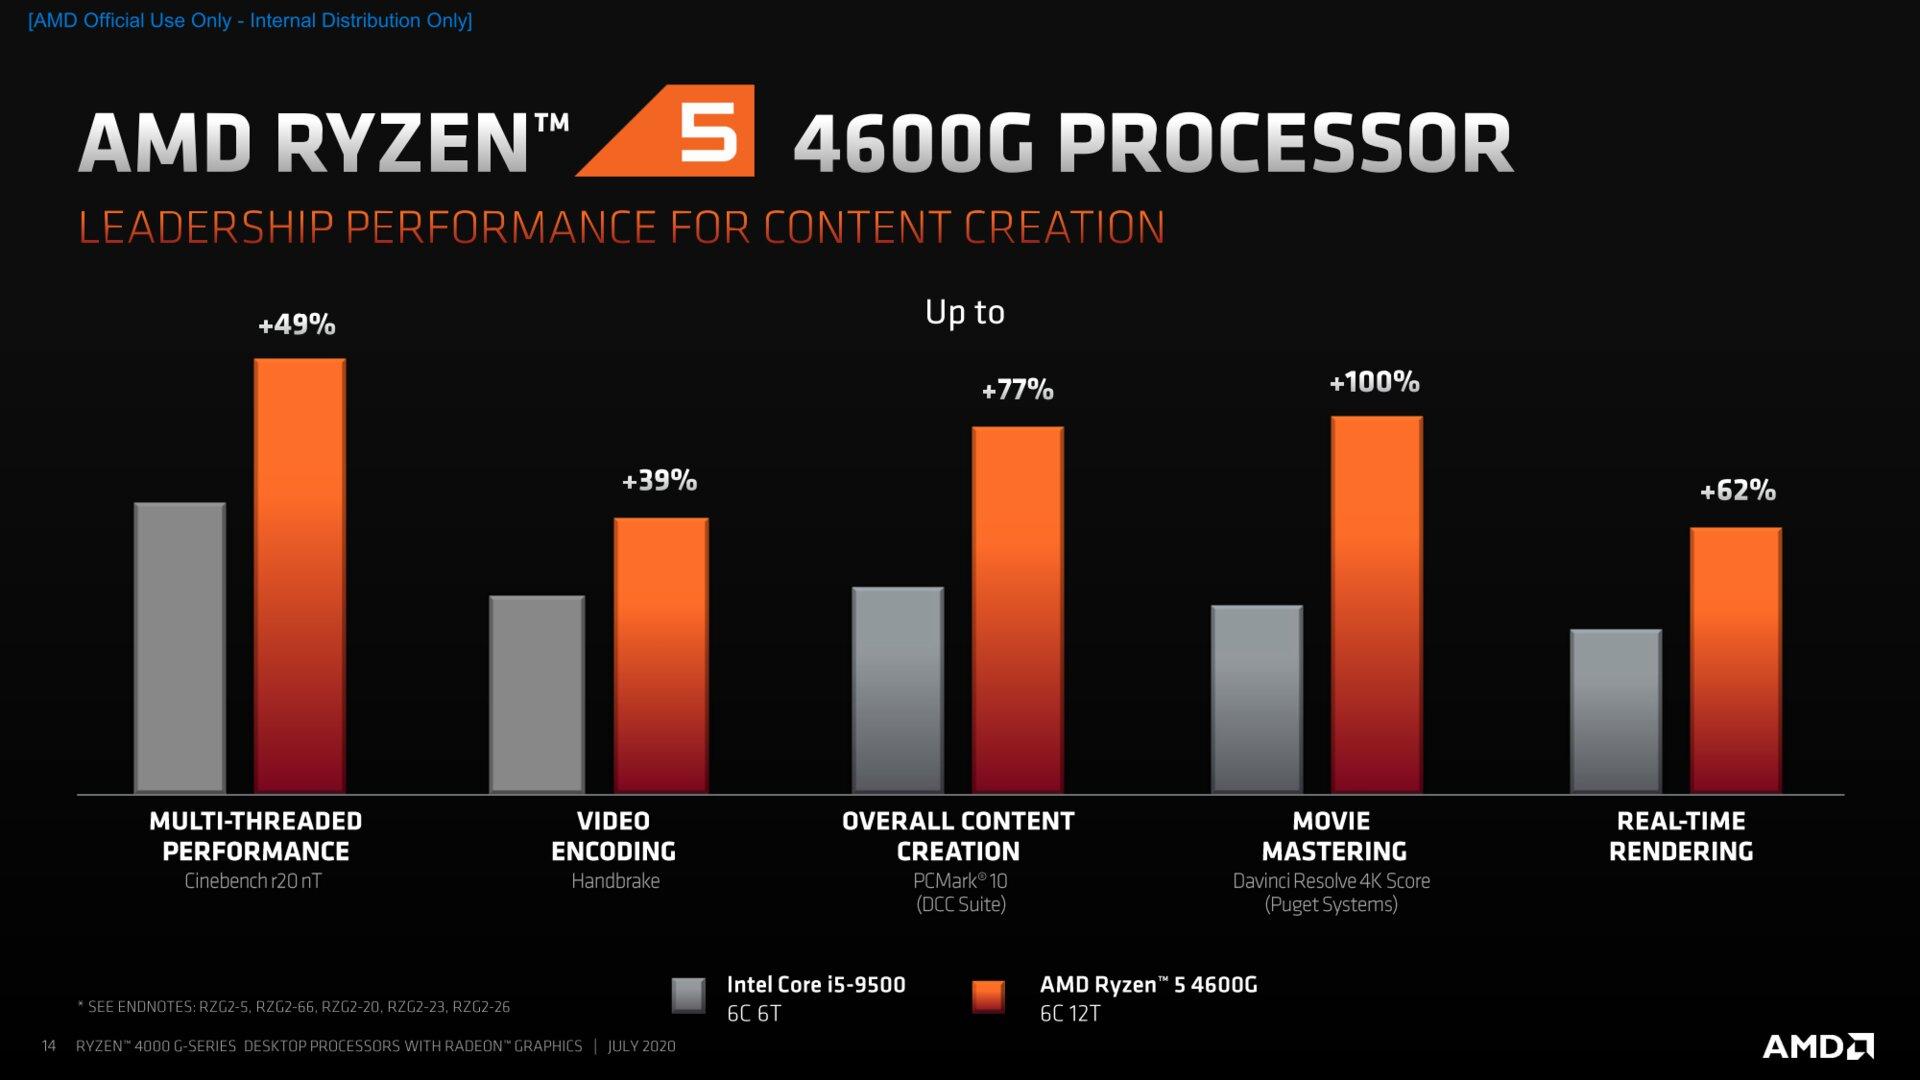 Ryzen 5 4600G Benchmarks